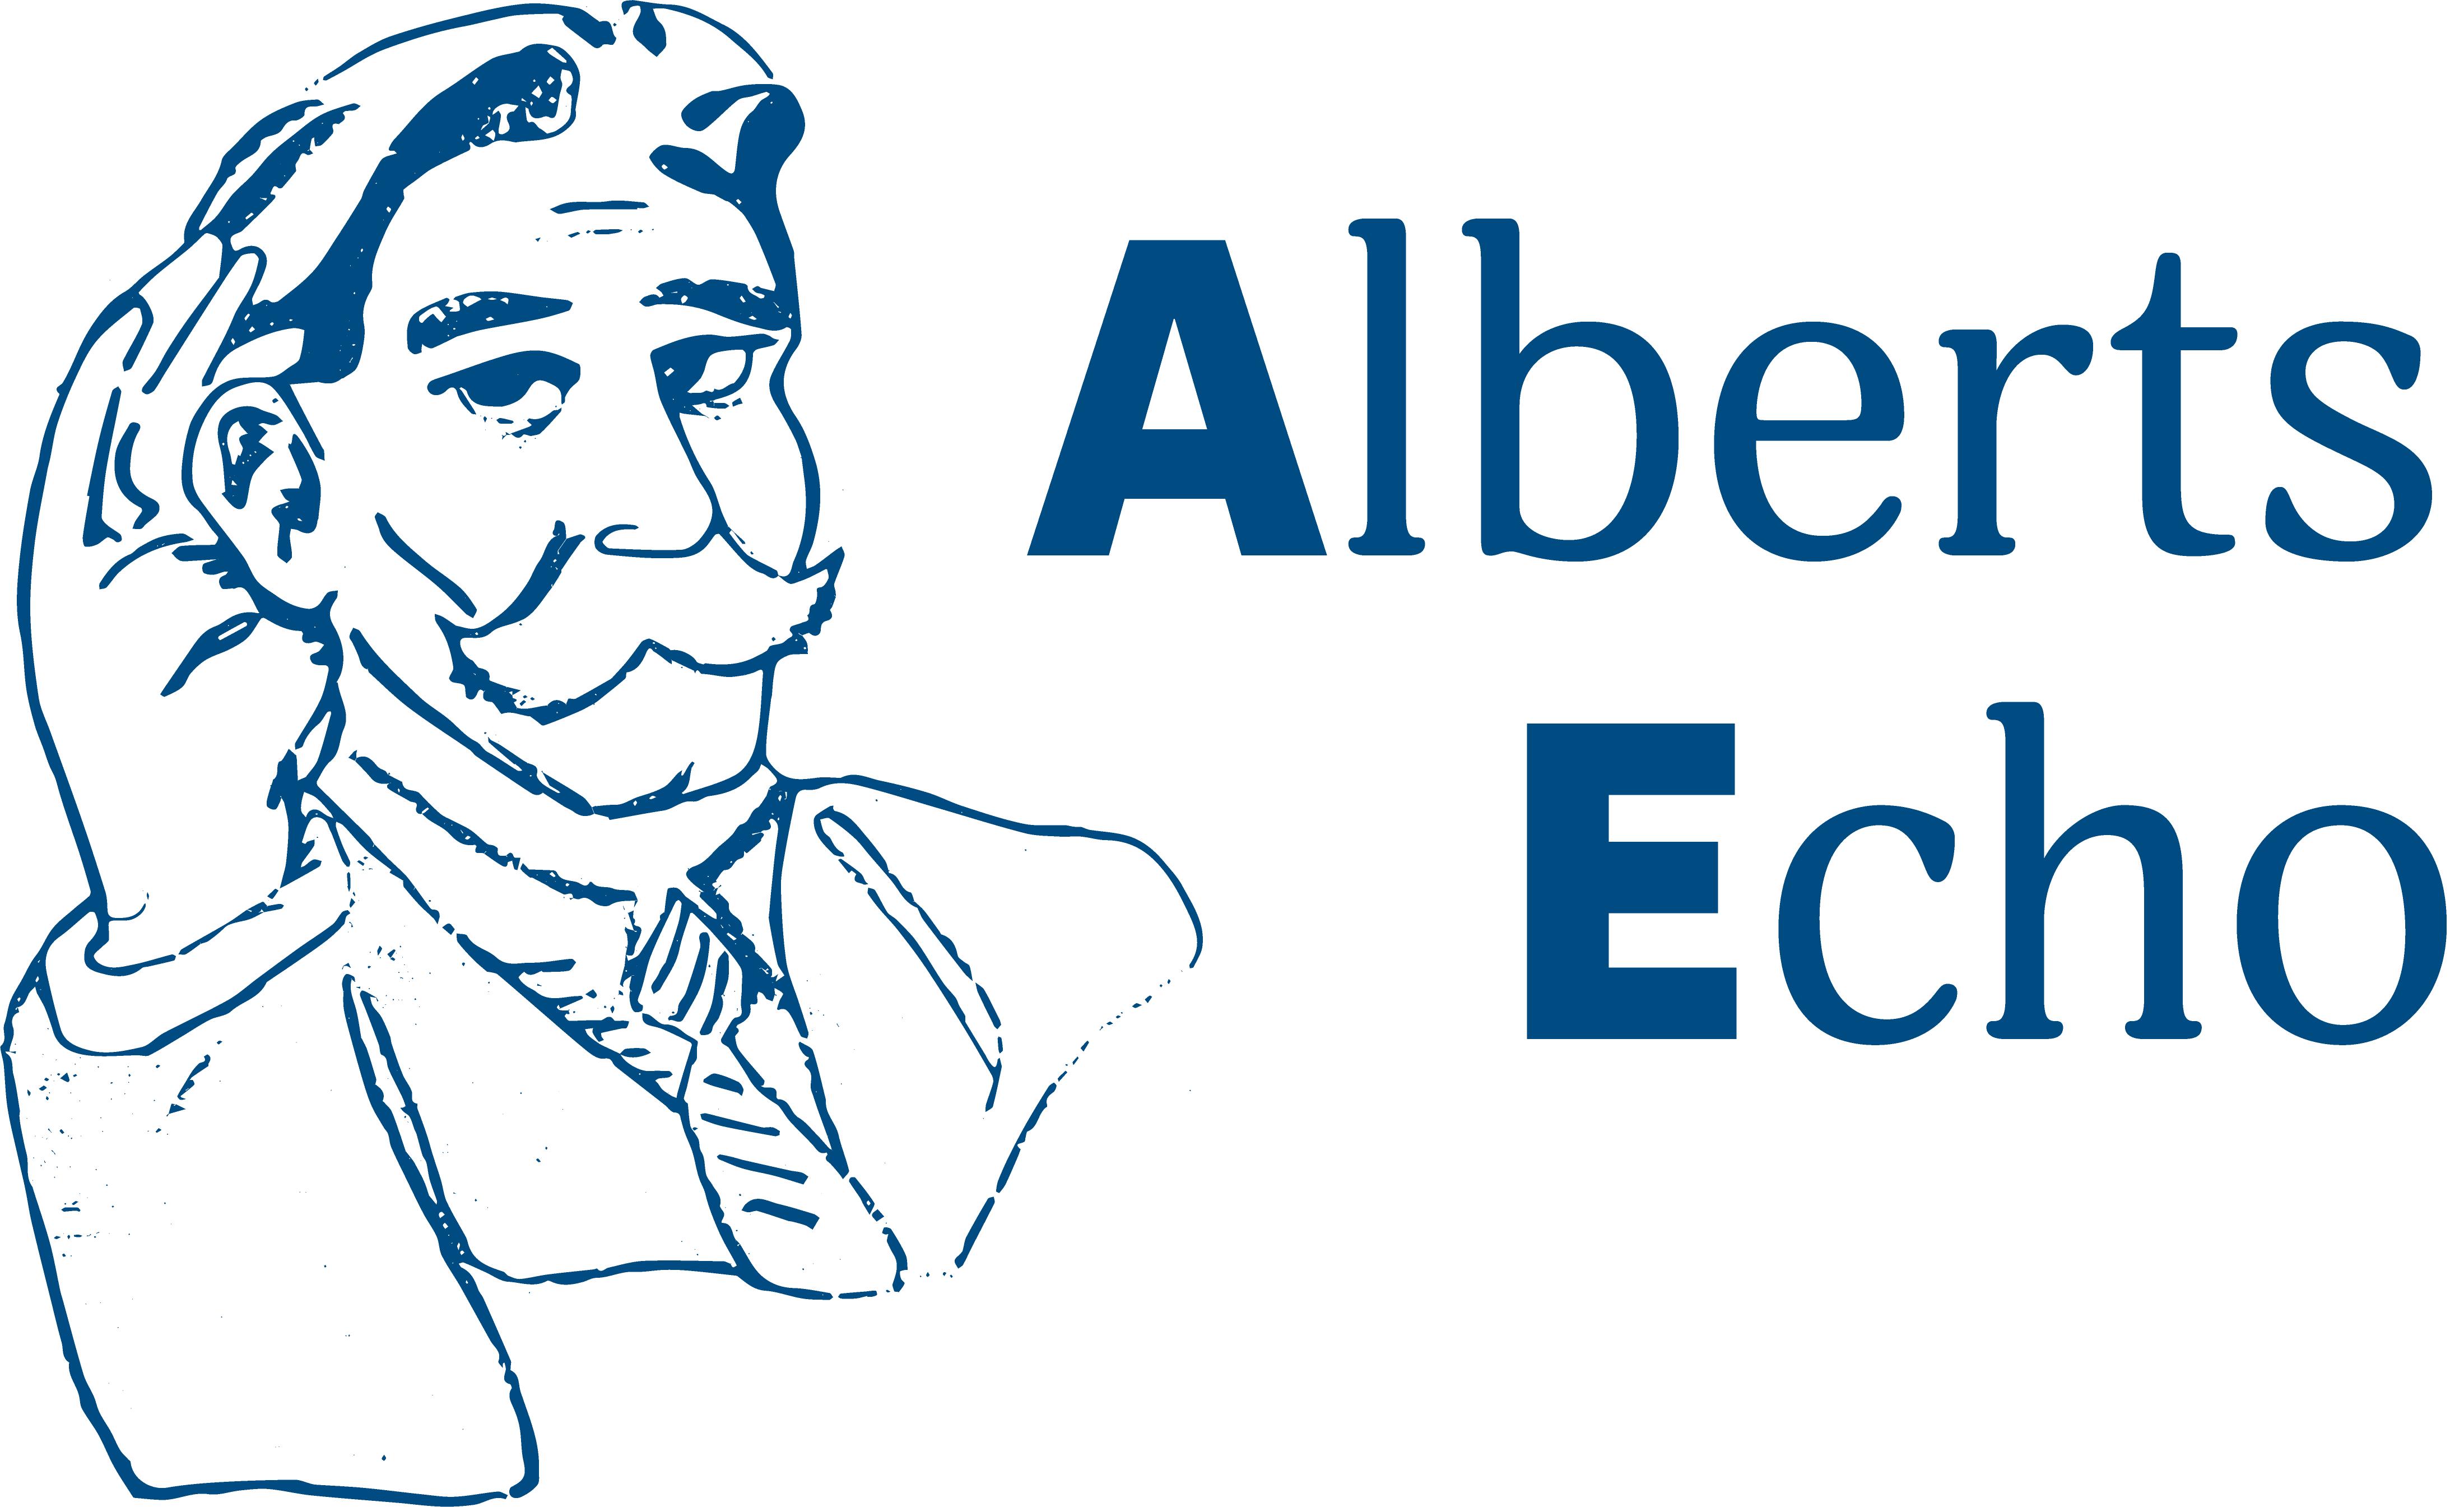 ALBERTS ECHO